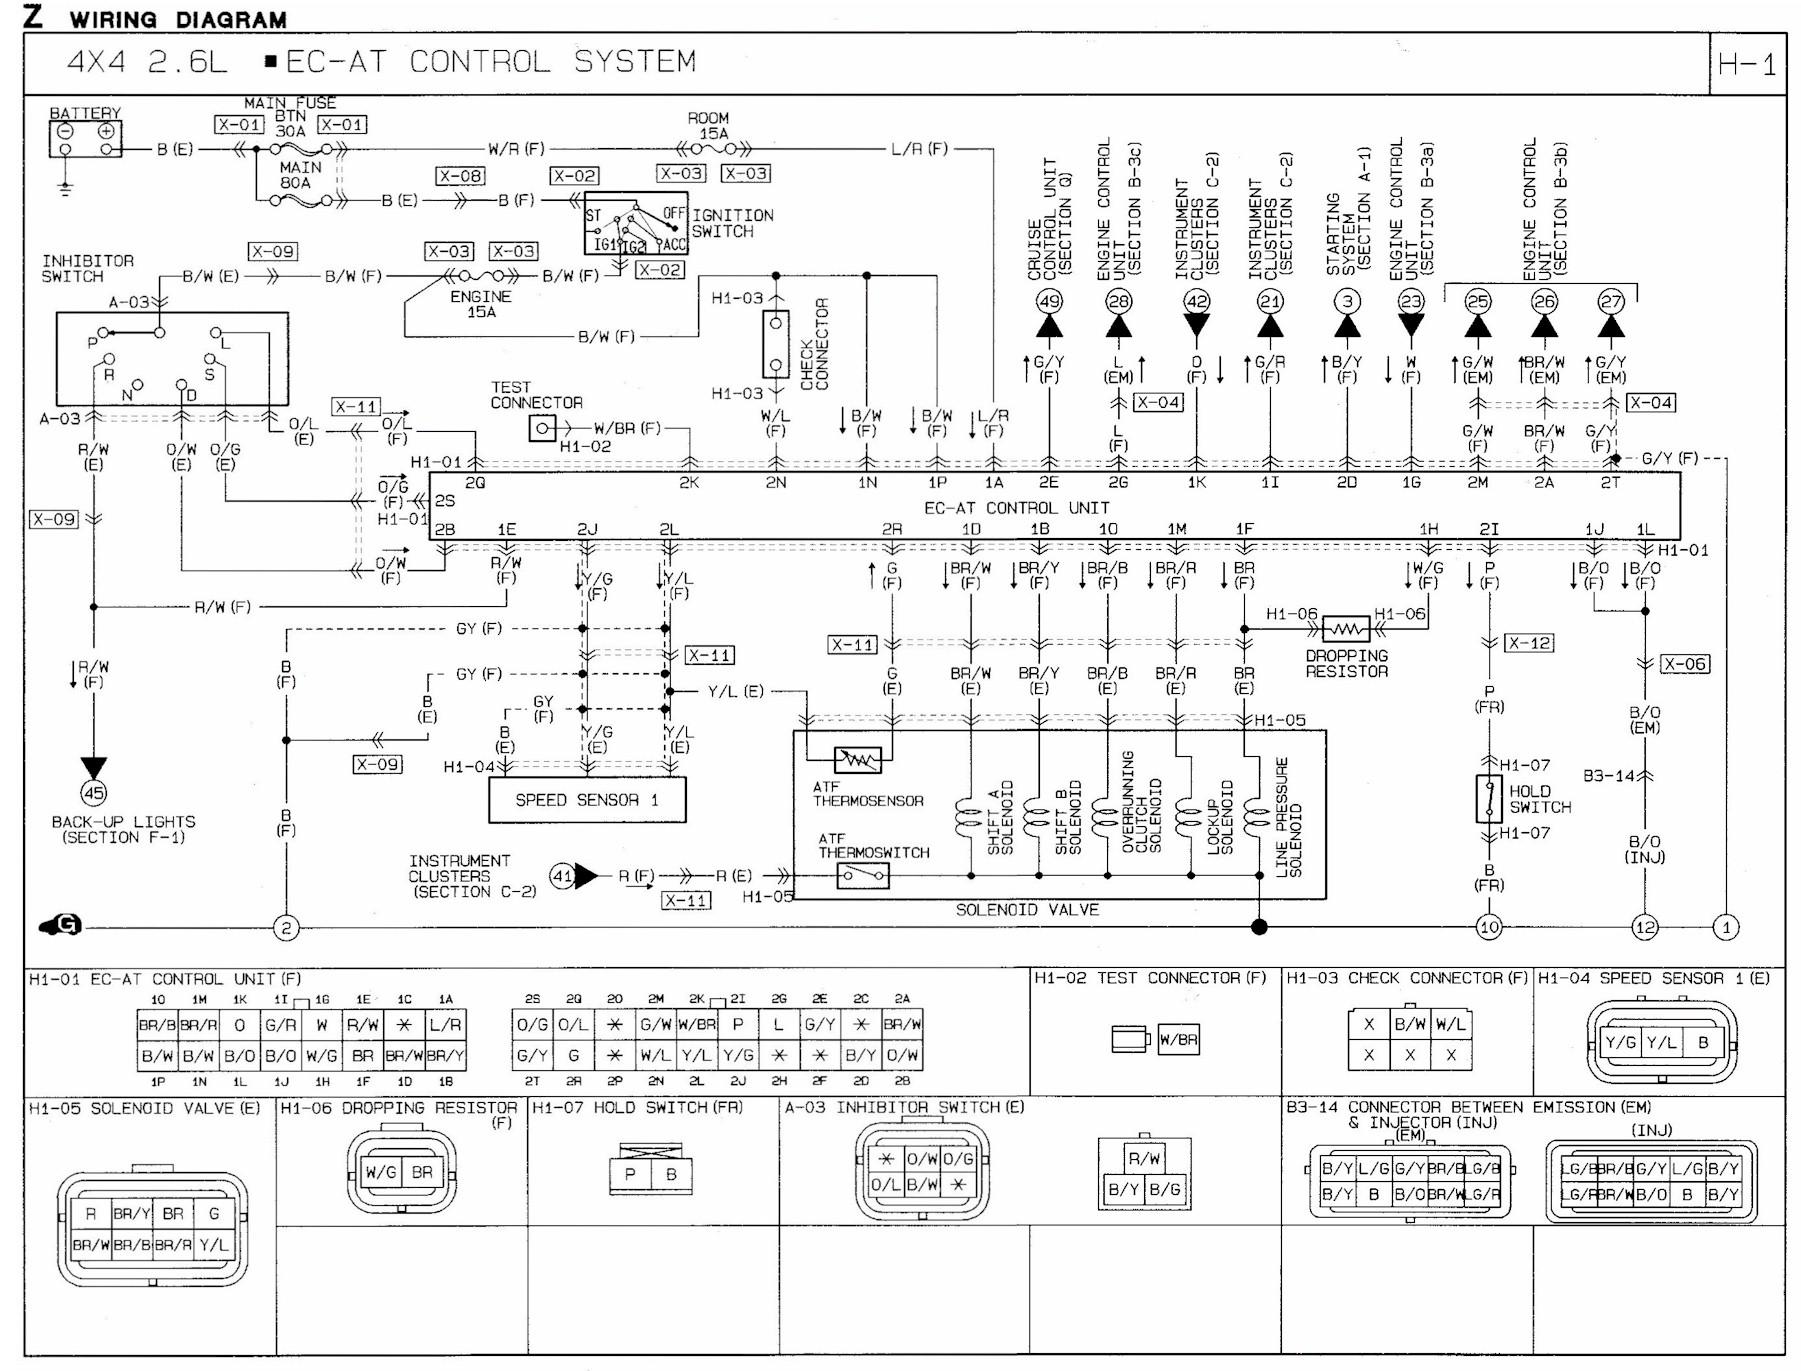 Mazda B2600 Wiring Diagram 2003 Ford F 150 Trailer Wiring Diagram 1982dodge Ati Loro Jeanjaures37 Fr